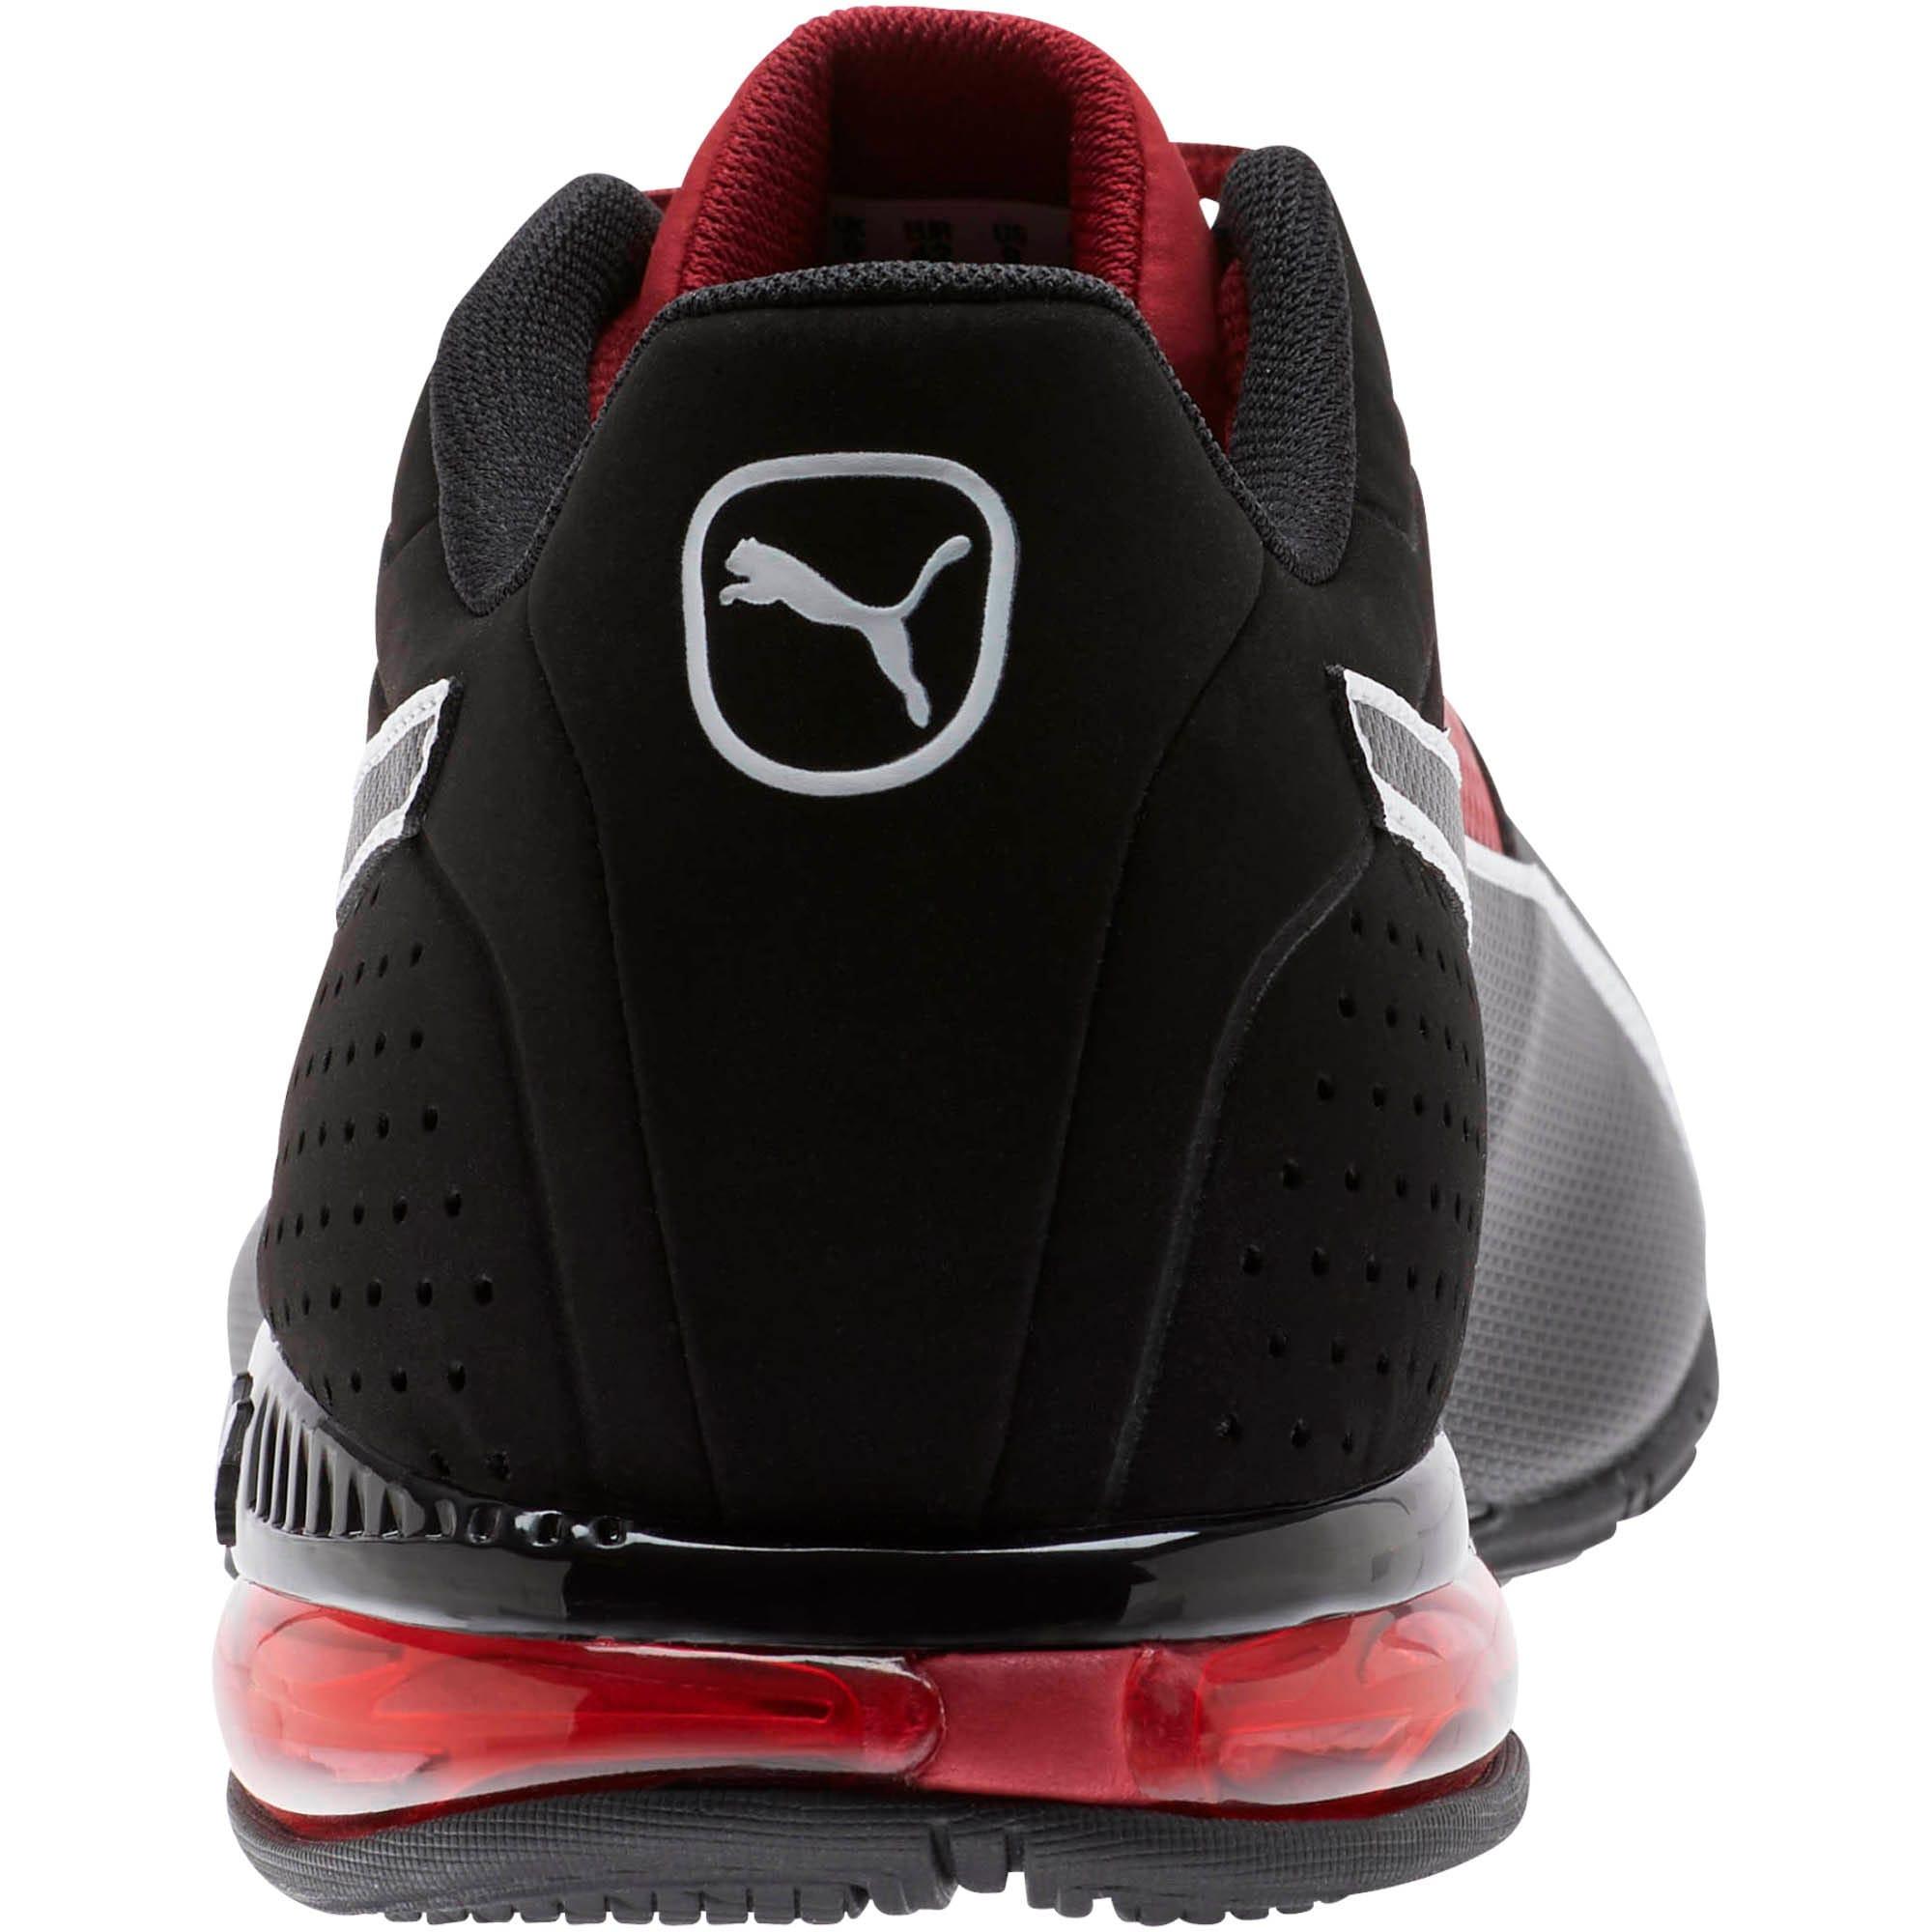 Thumbnail 3 of CELL Surin 2 Matte Men's Training Shoes, Rhubarb-Puma White, medium